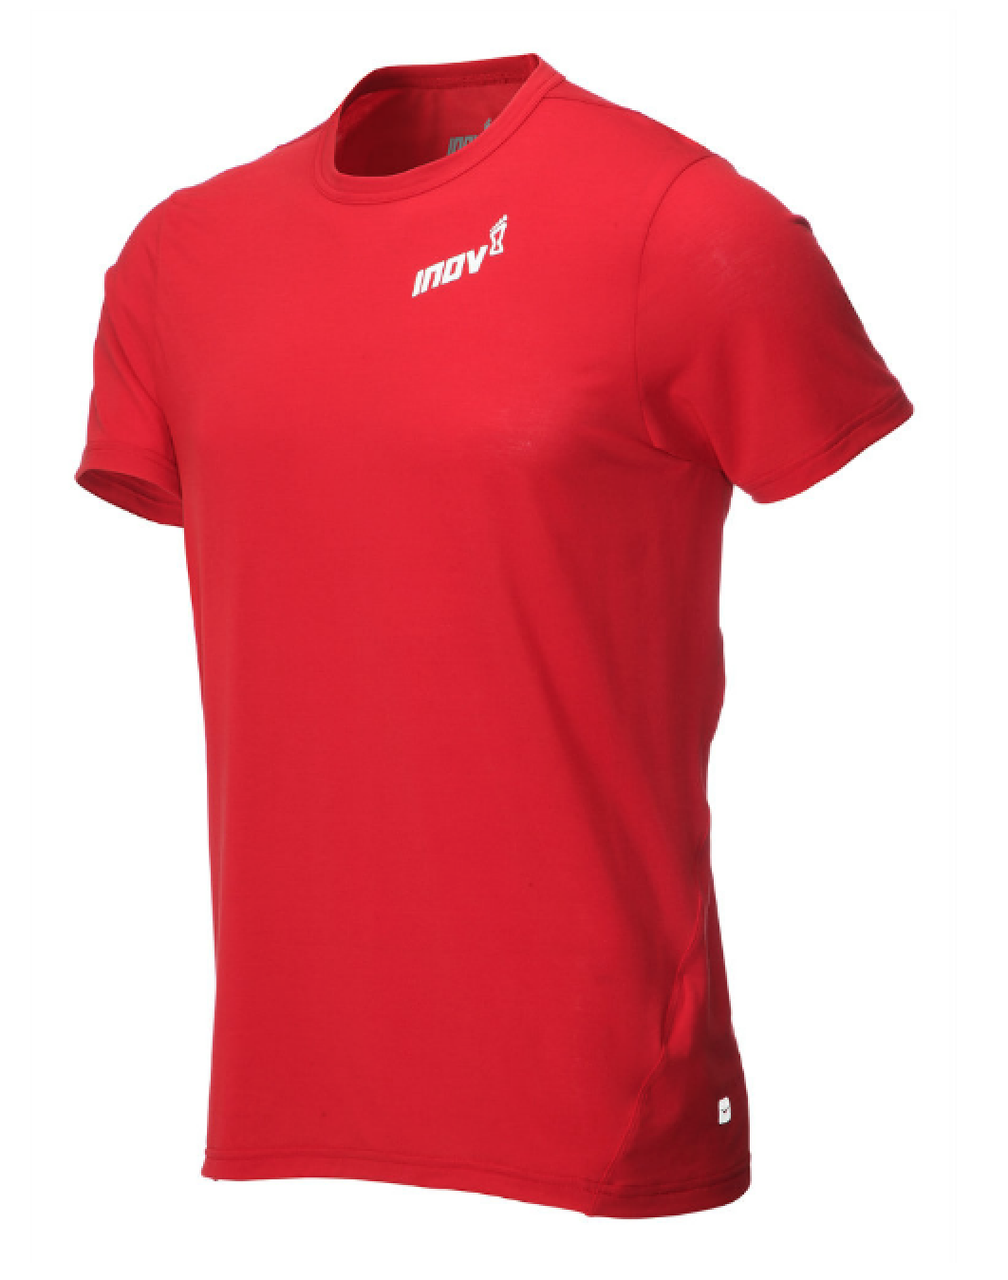 AT/C DRI Release мужская футболка для бега S - INOV-8 Ukraine в Киеве